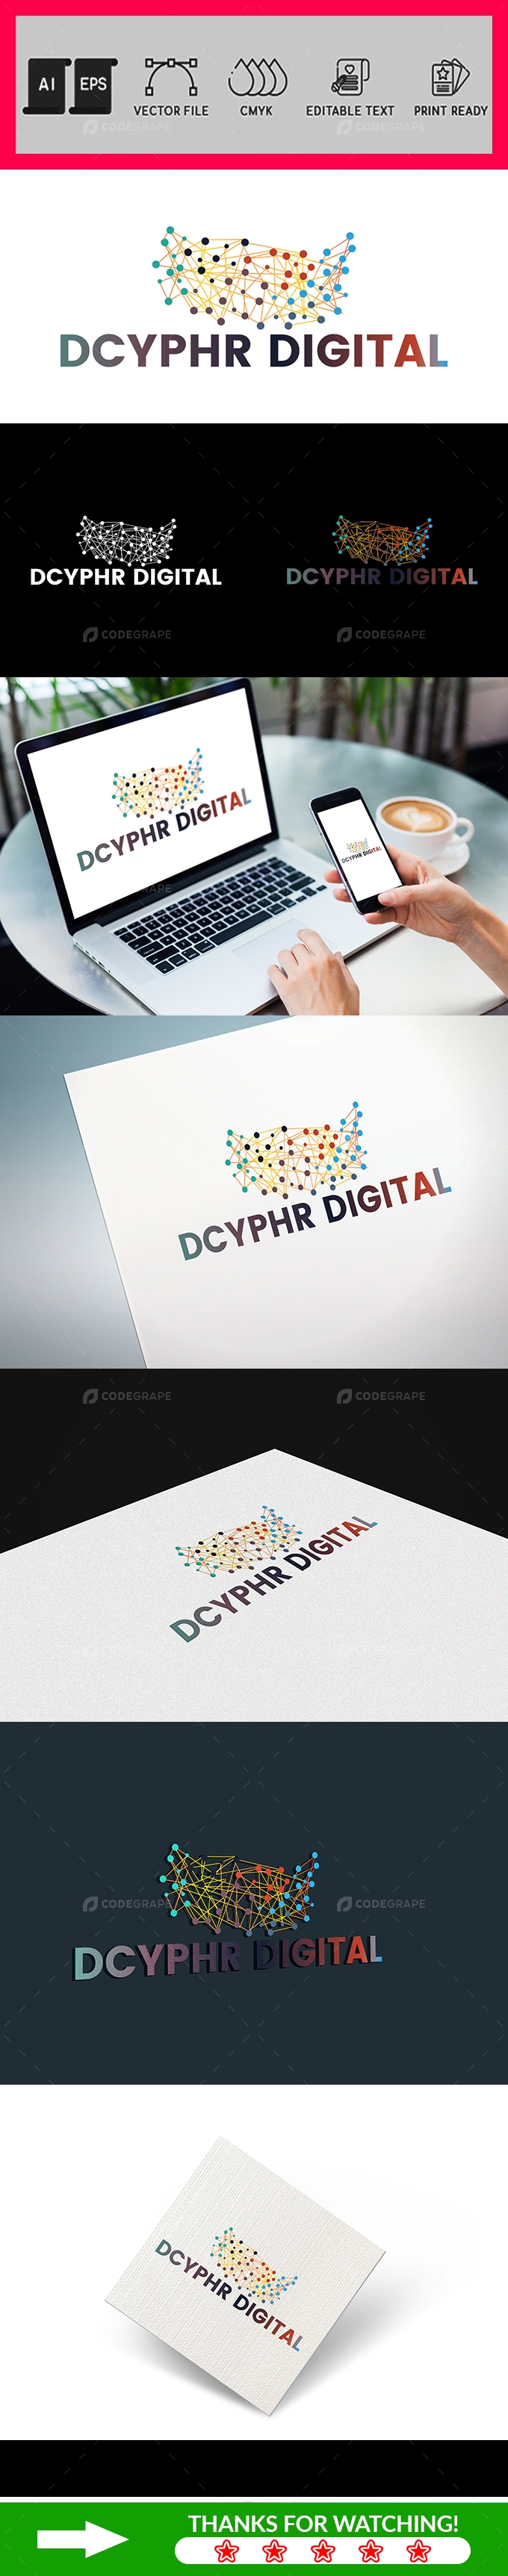 Digital Marketing Corporate Logo